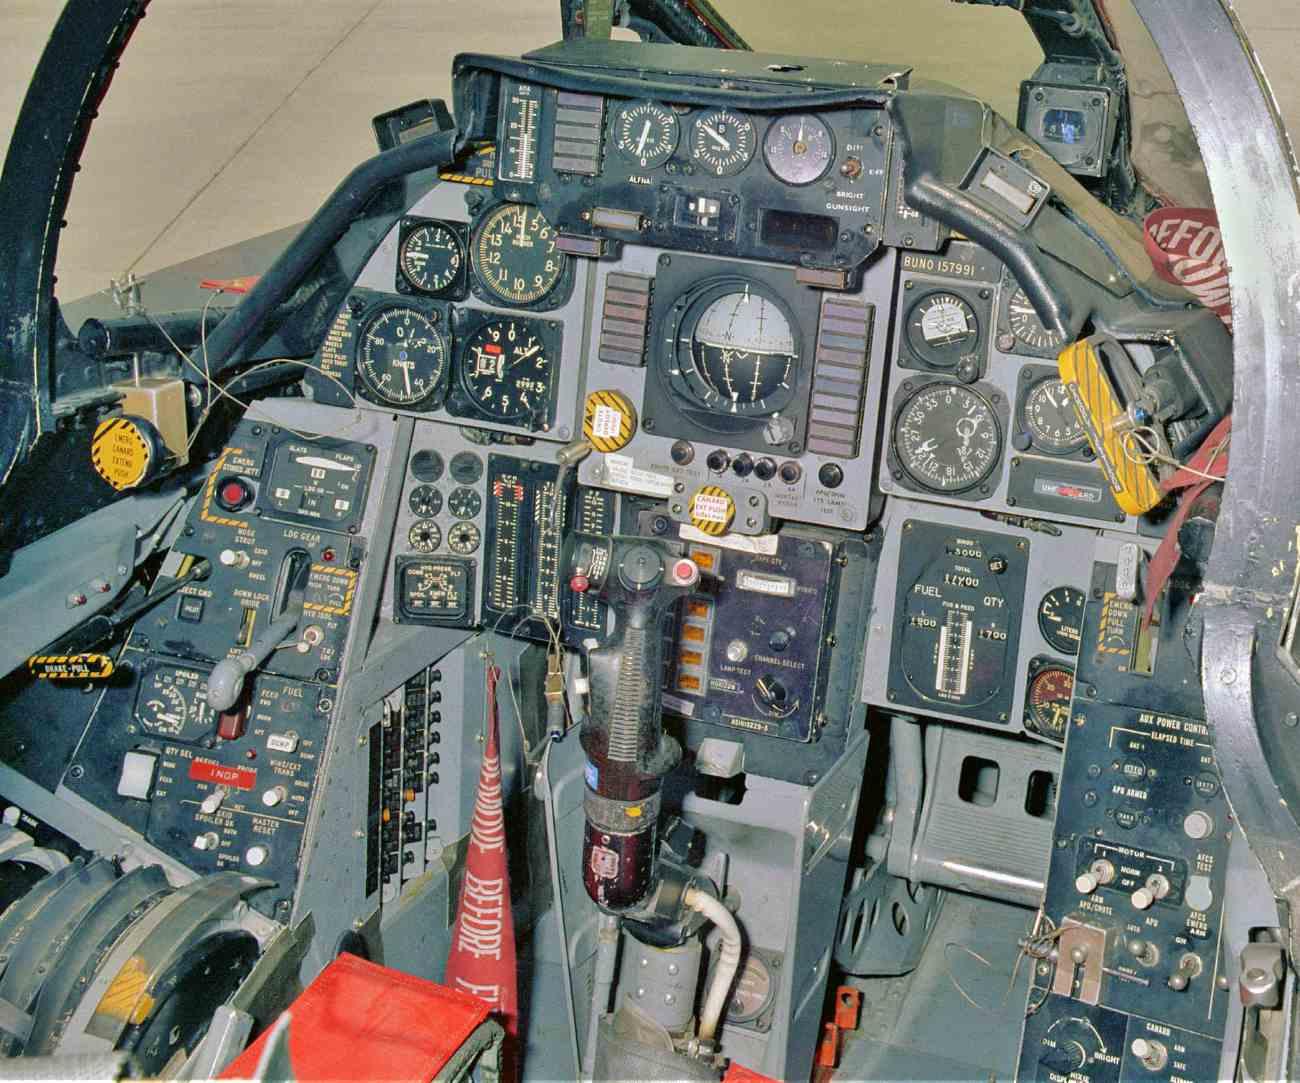 Attack Aircraft Cockpit Images, F-14 cockpit